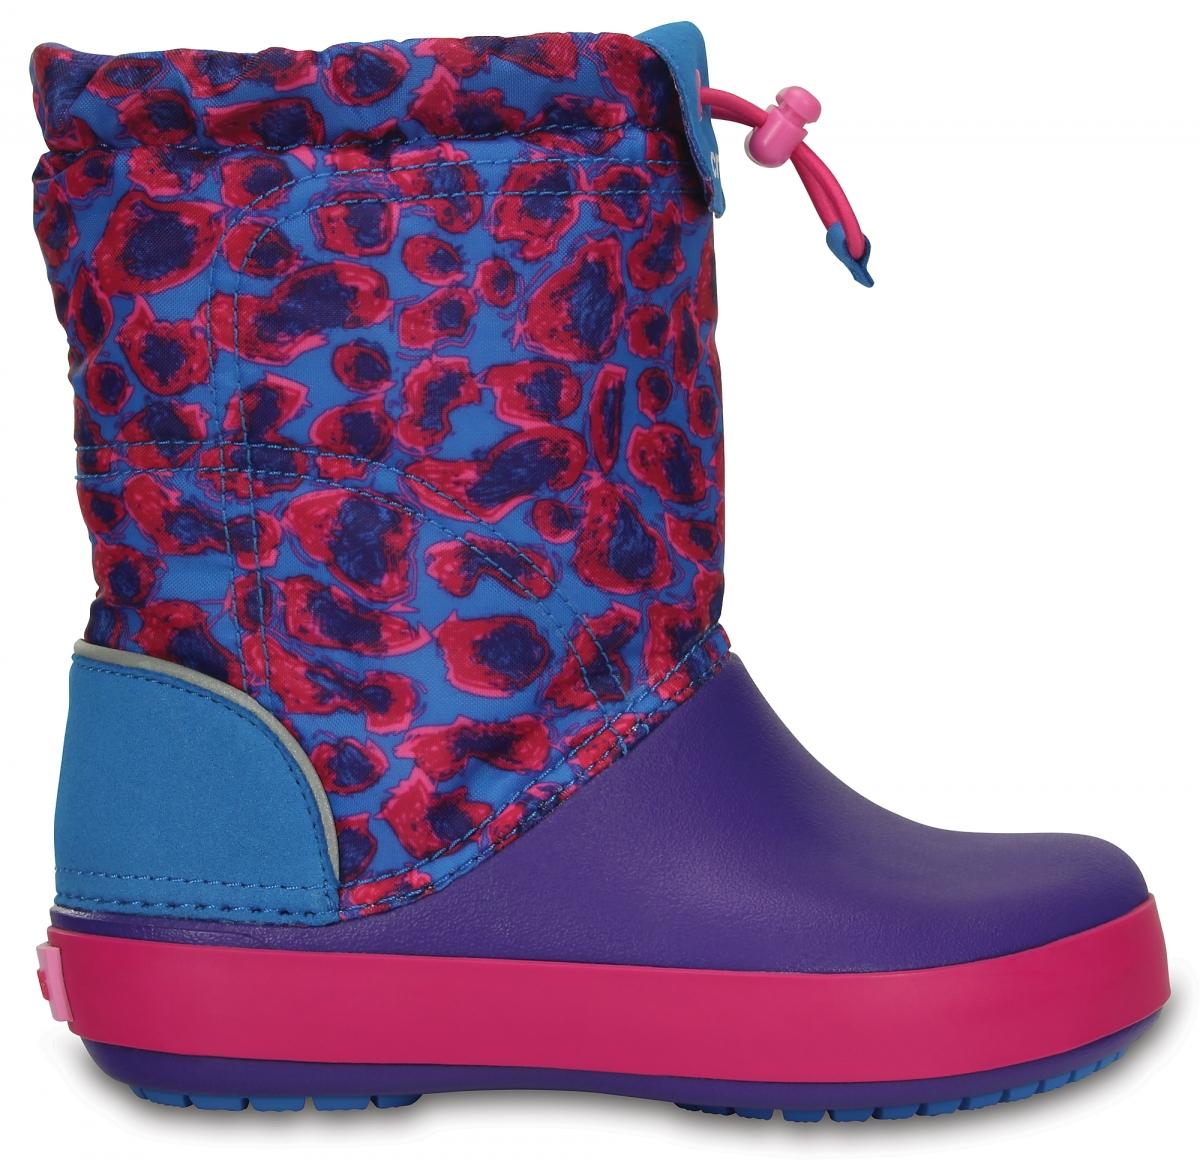 Crocs Crocband LodgePoint Graphic Boot Kids Leopard, J1 (32-33)